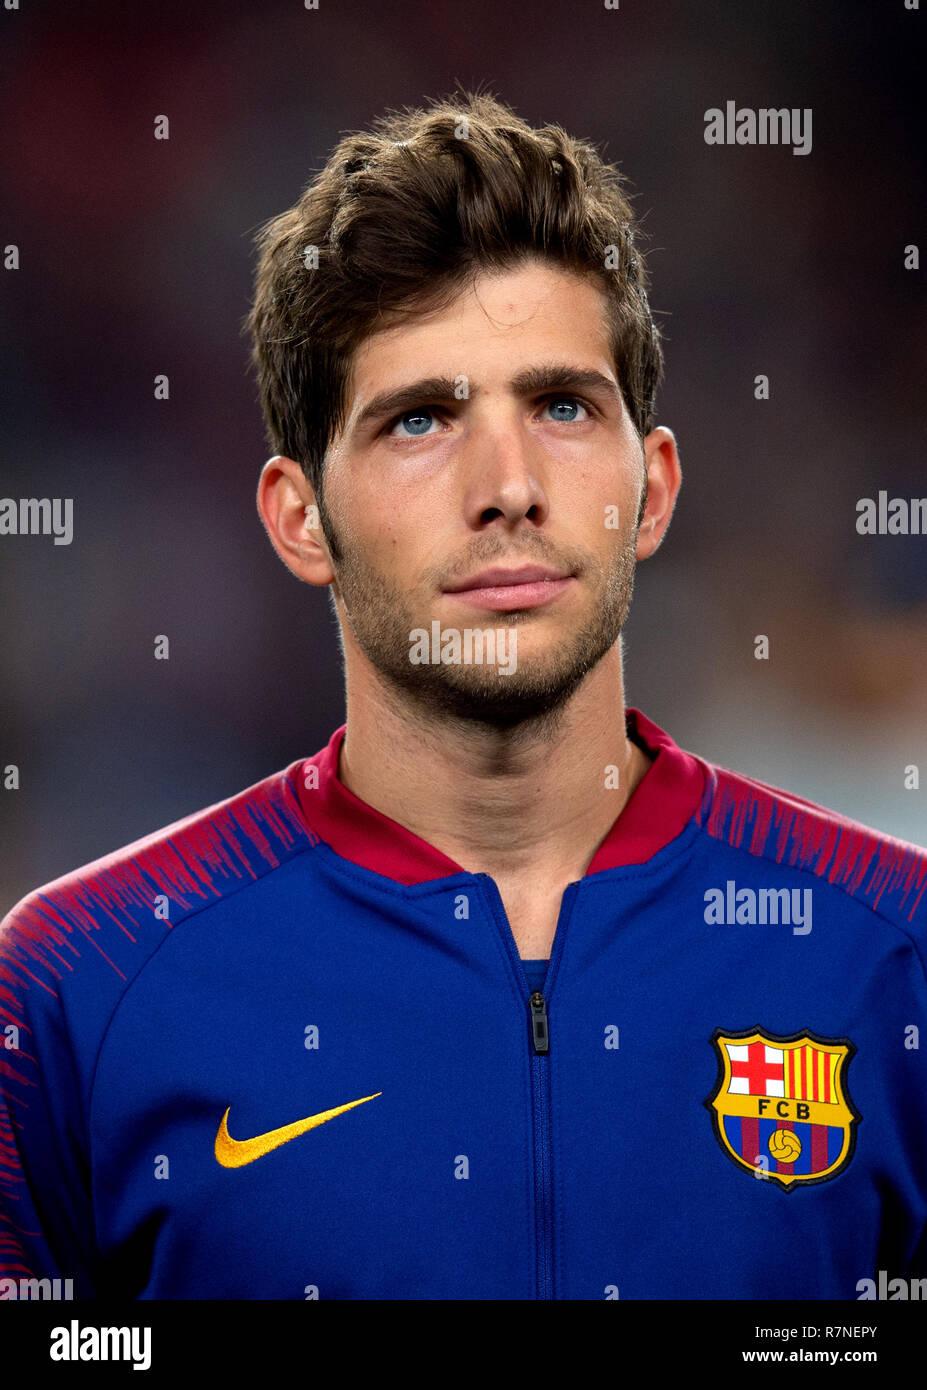 Spain - La Liga Santander 2018-2019 /  ( F.C. Barcelona ) -  Sergi Roberto - Stock Image